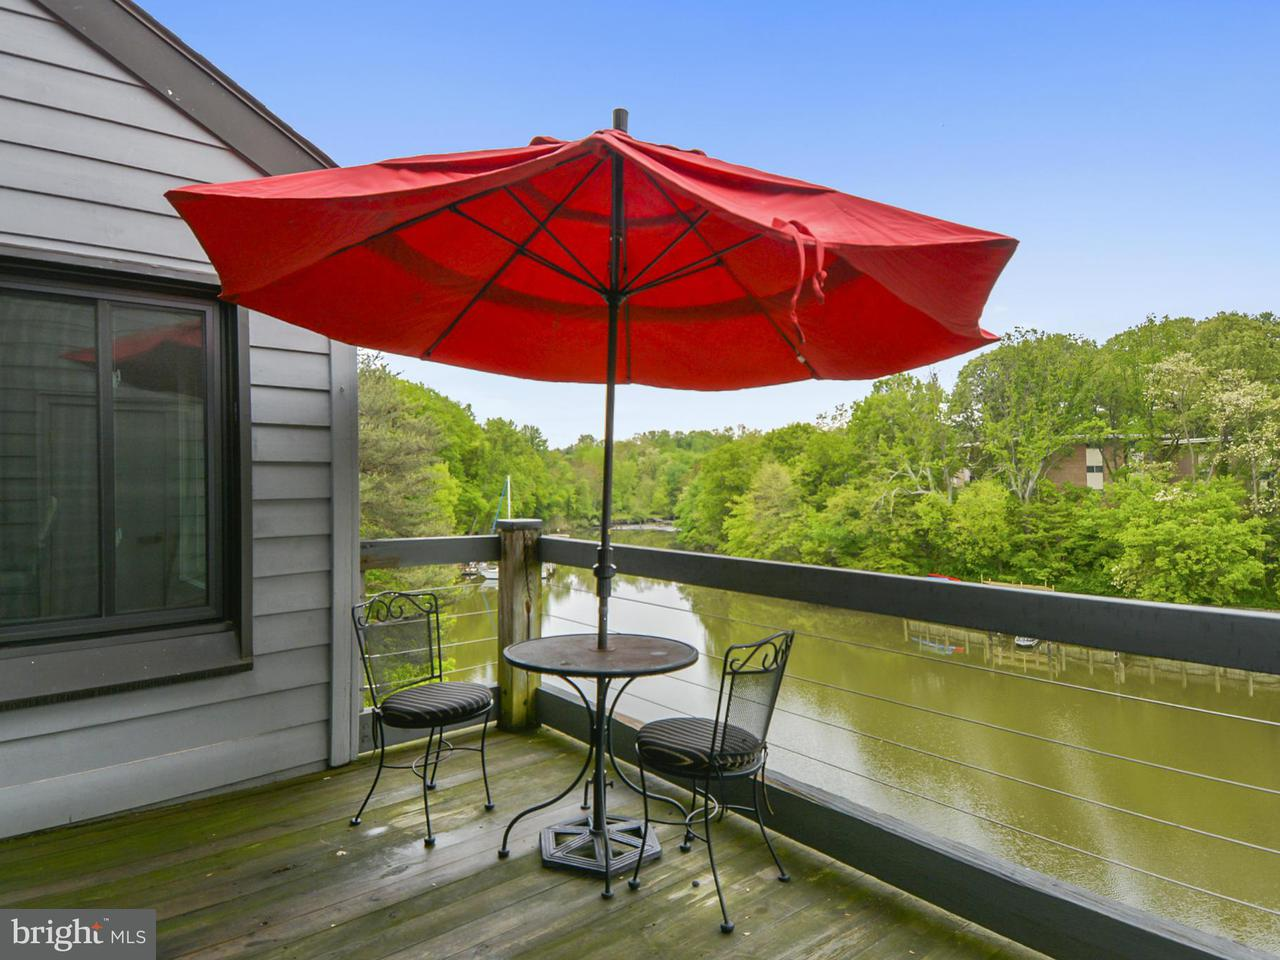 Condominium for Sale at 14 SPA CREEK LNDG #B3 14 SPA CREEK LNDG #B3 Annapolis, Maryland 21403 United States